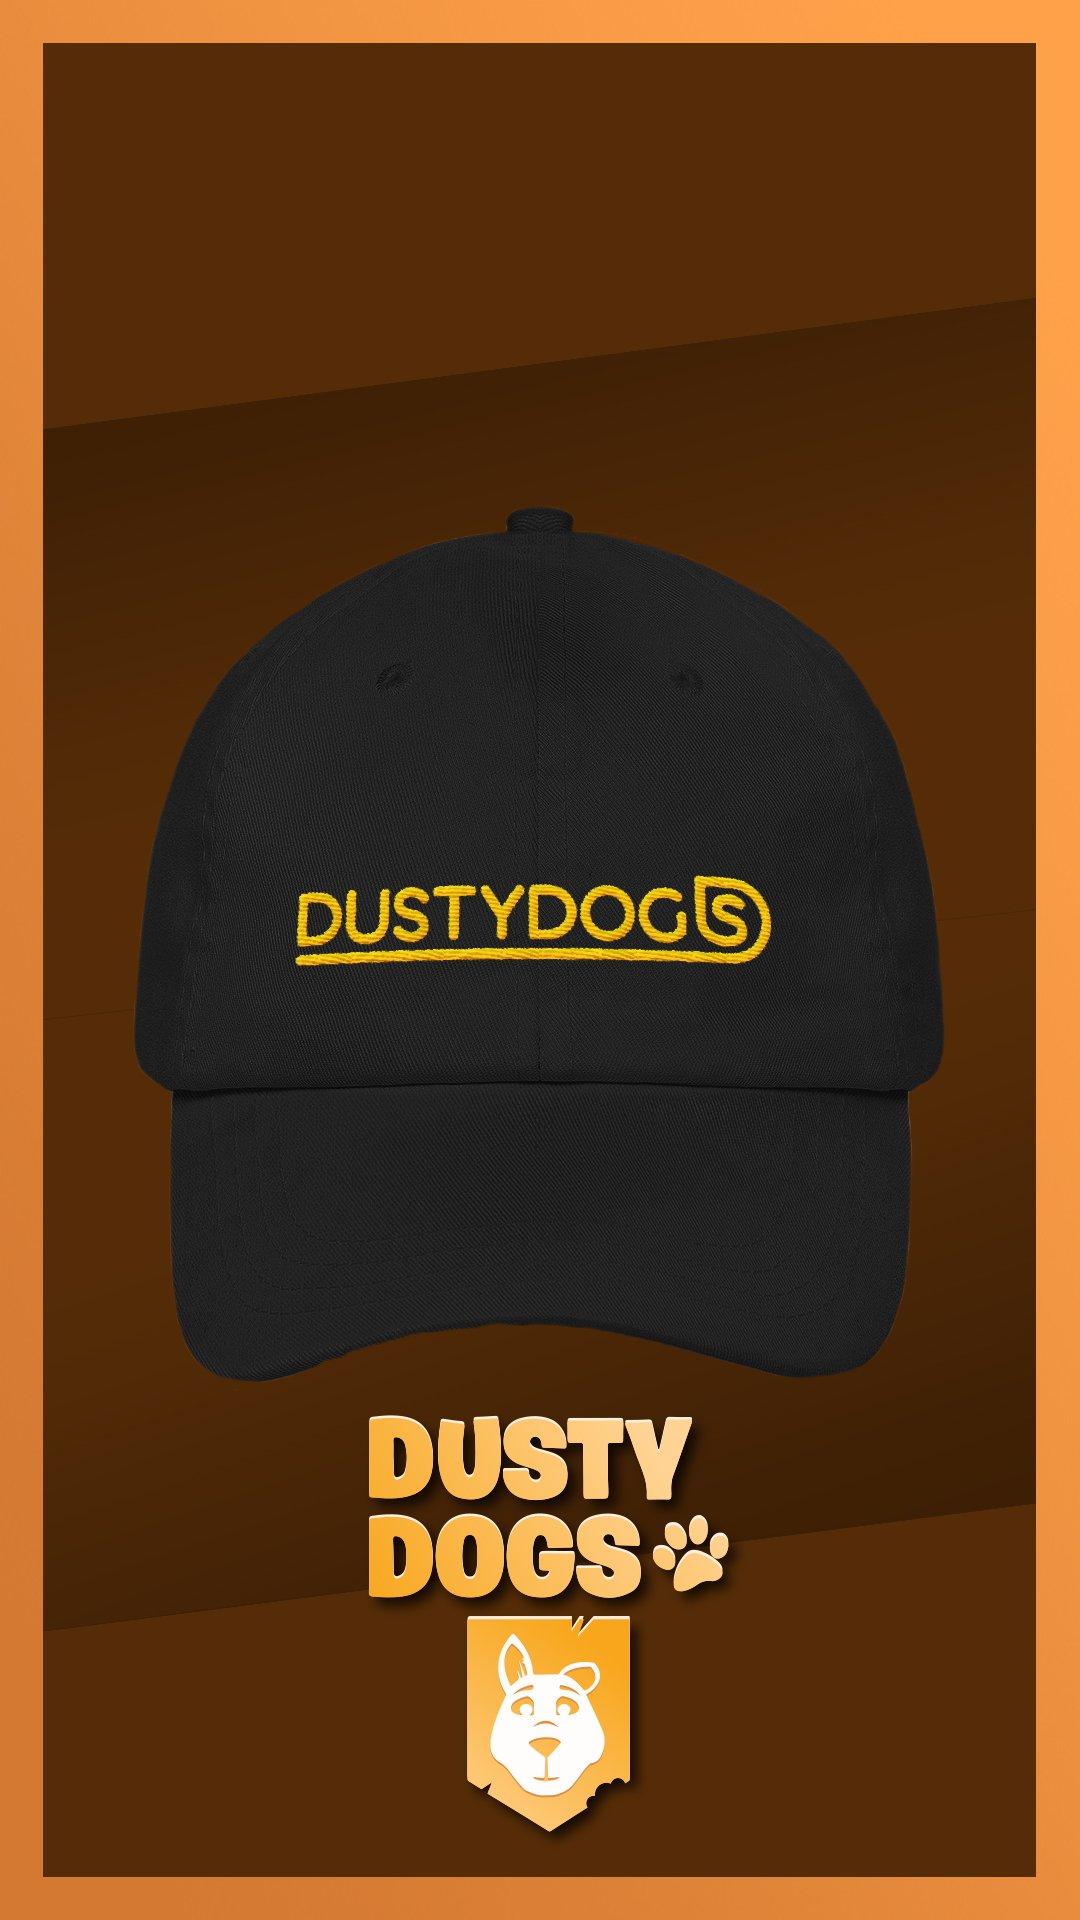 Image of DustydogSD